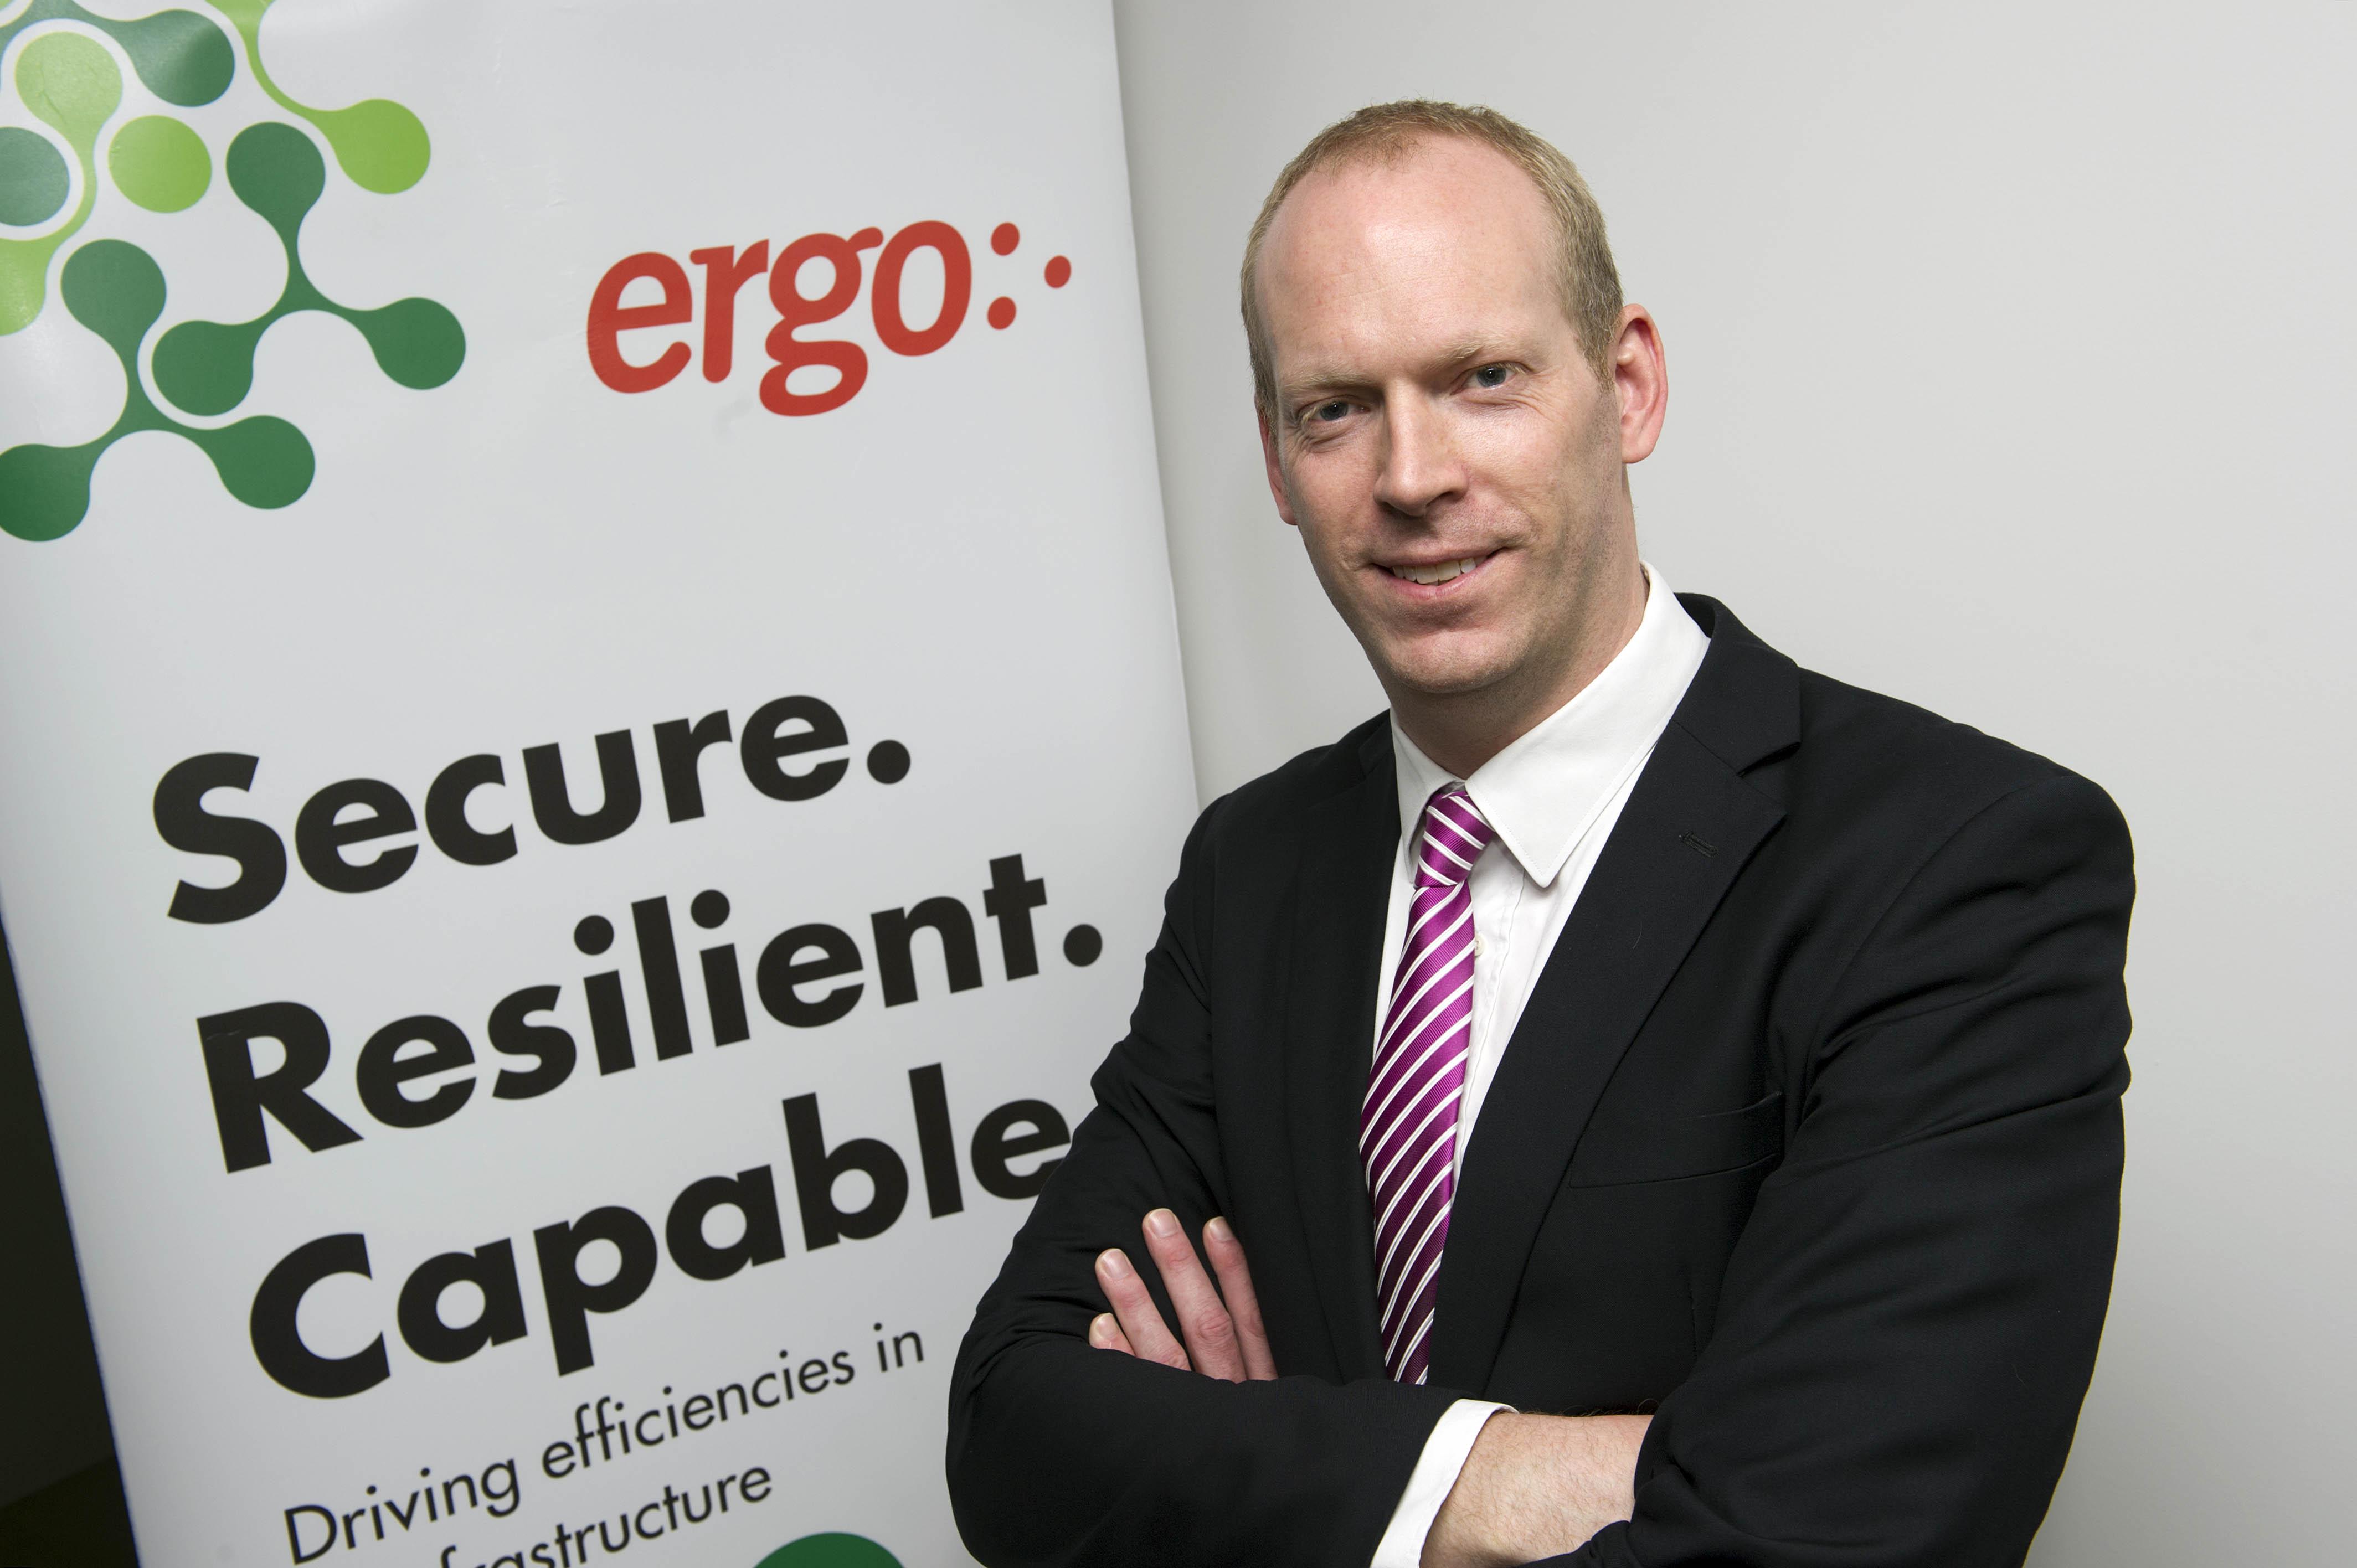 Ergo - David Kernan, Data Services Team Lead